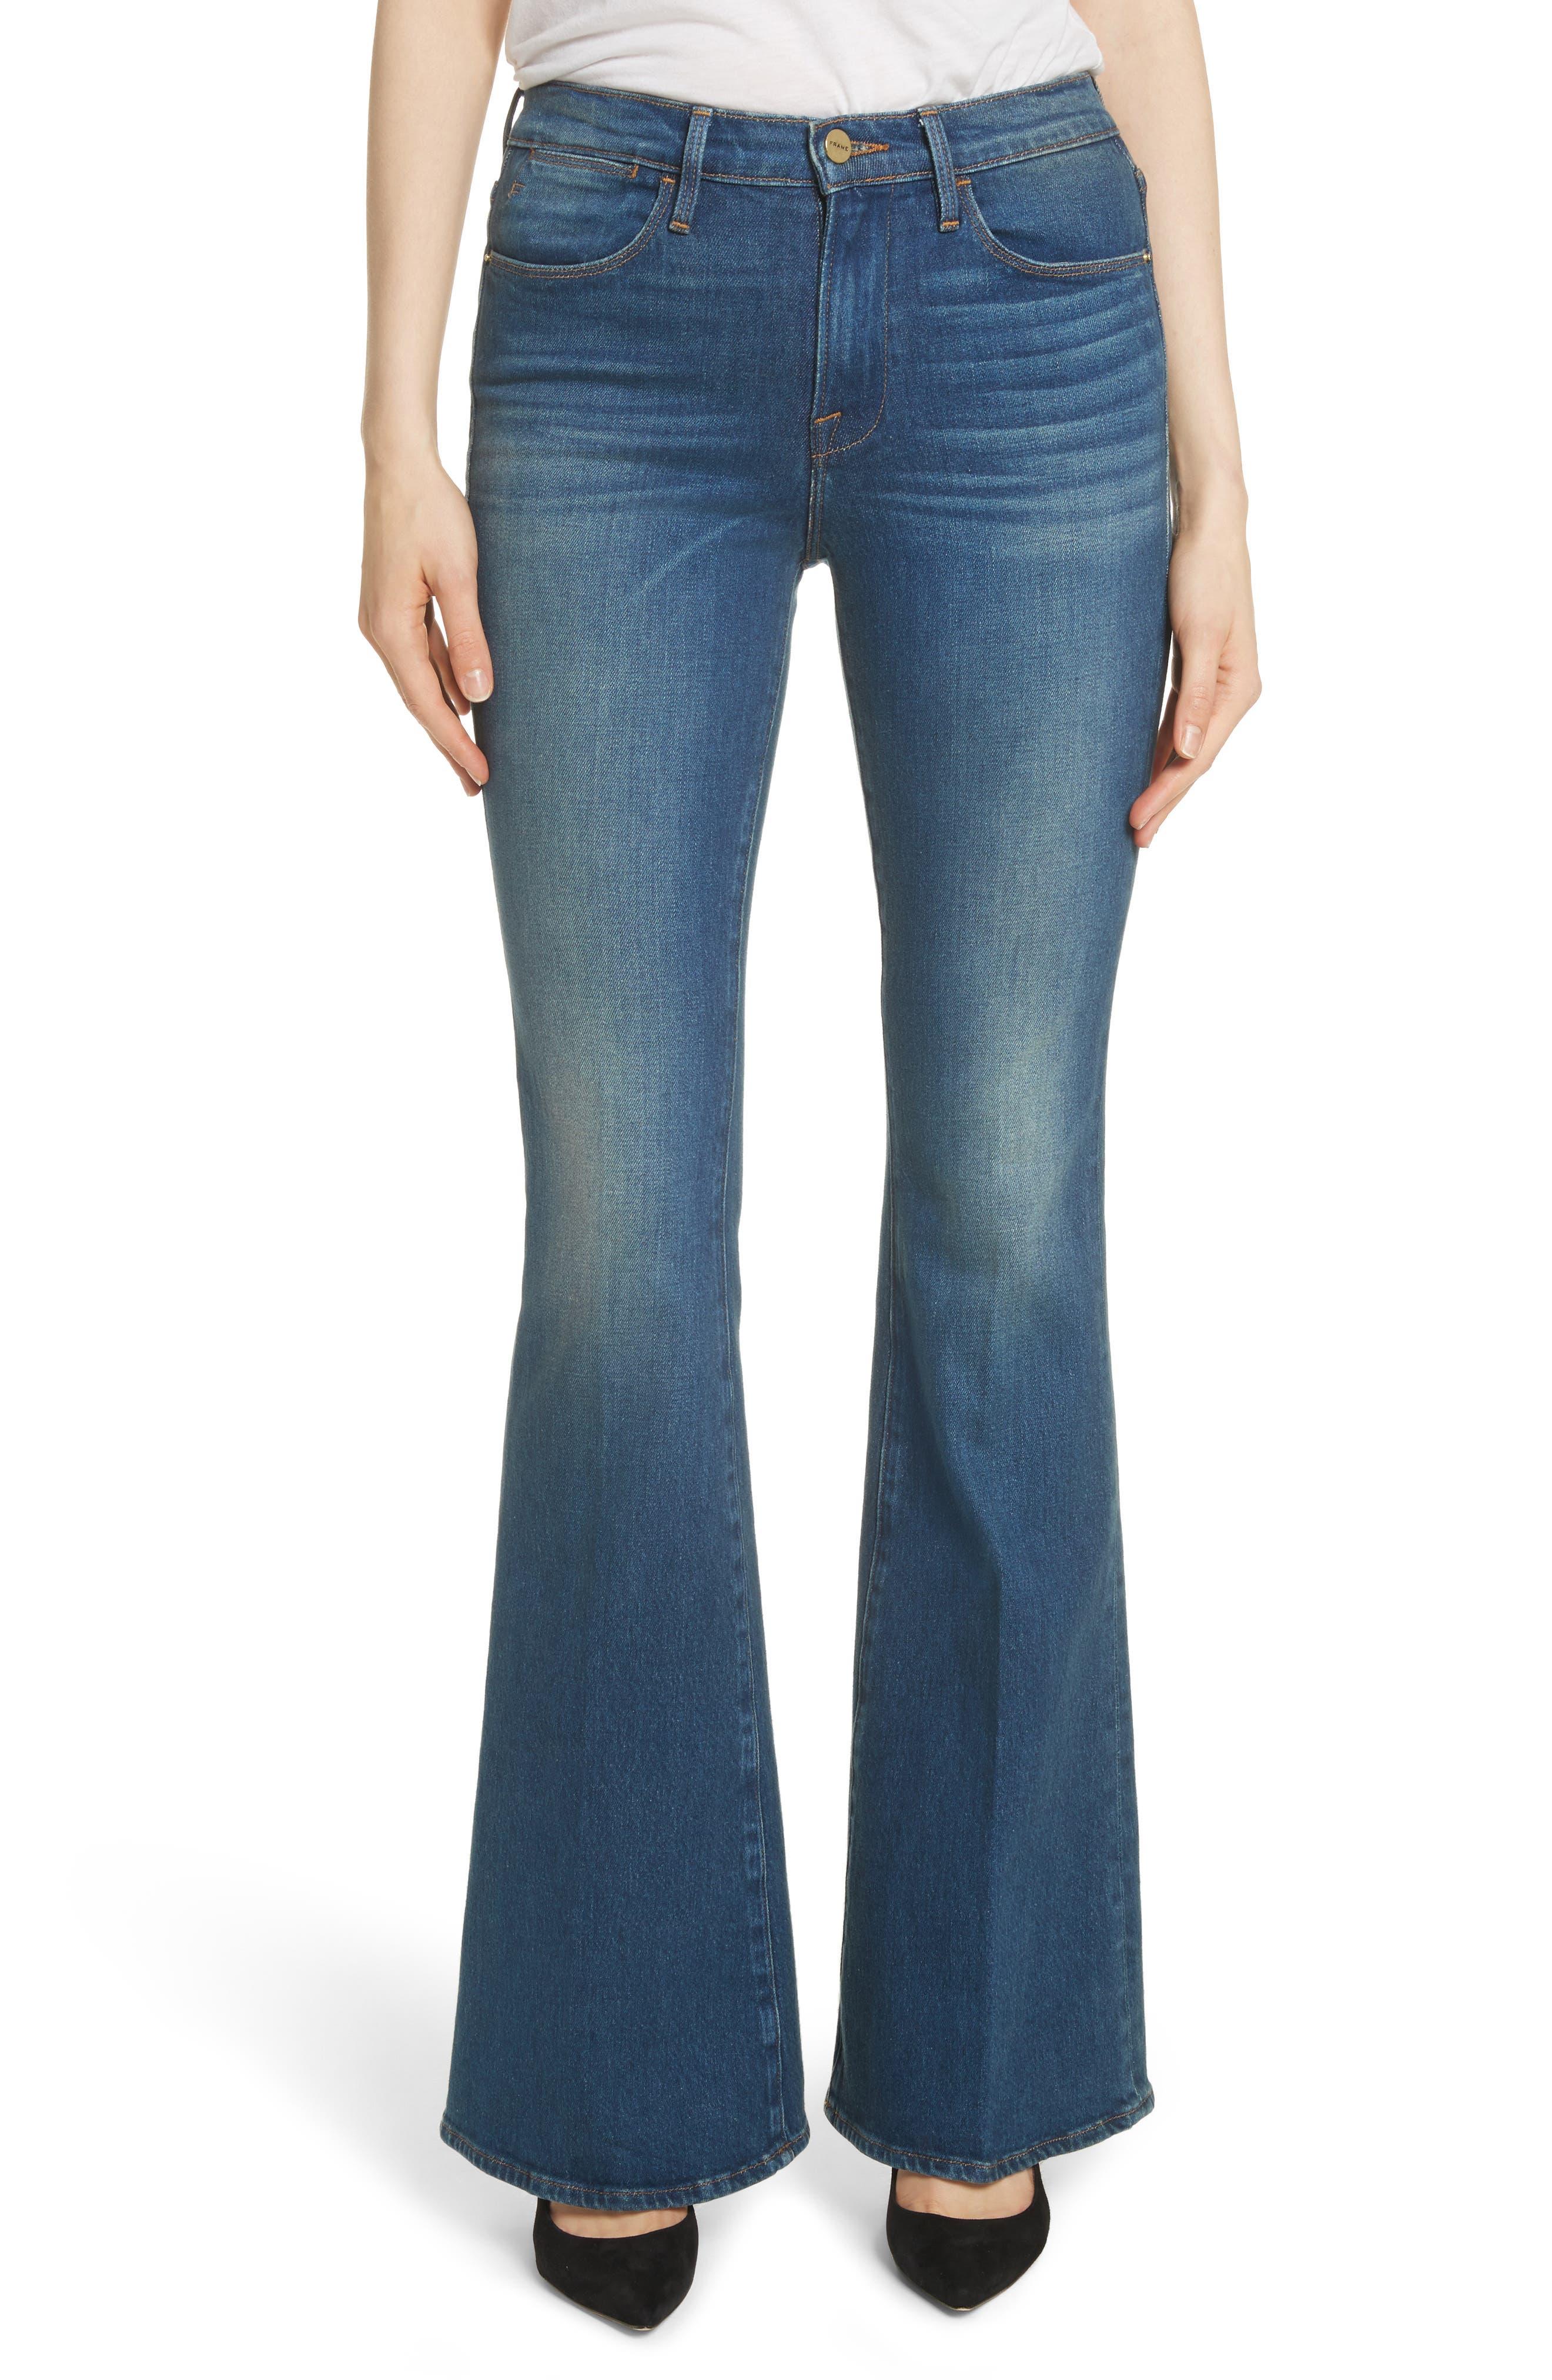 Le High Flare Jeans,                         Main,                         color, Aldwoth